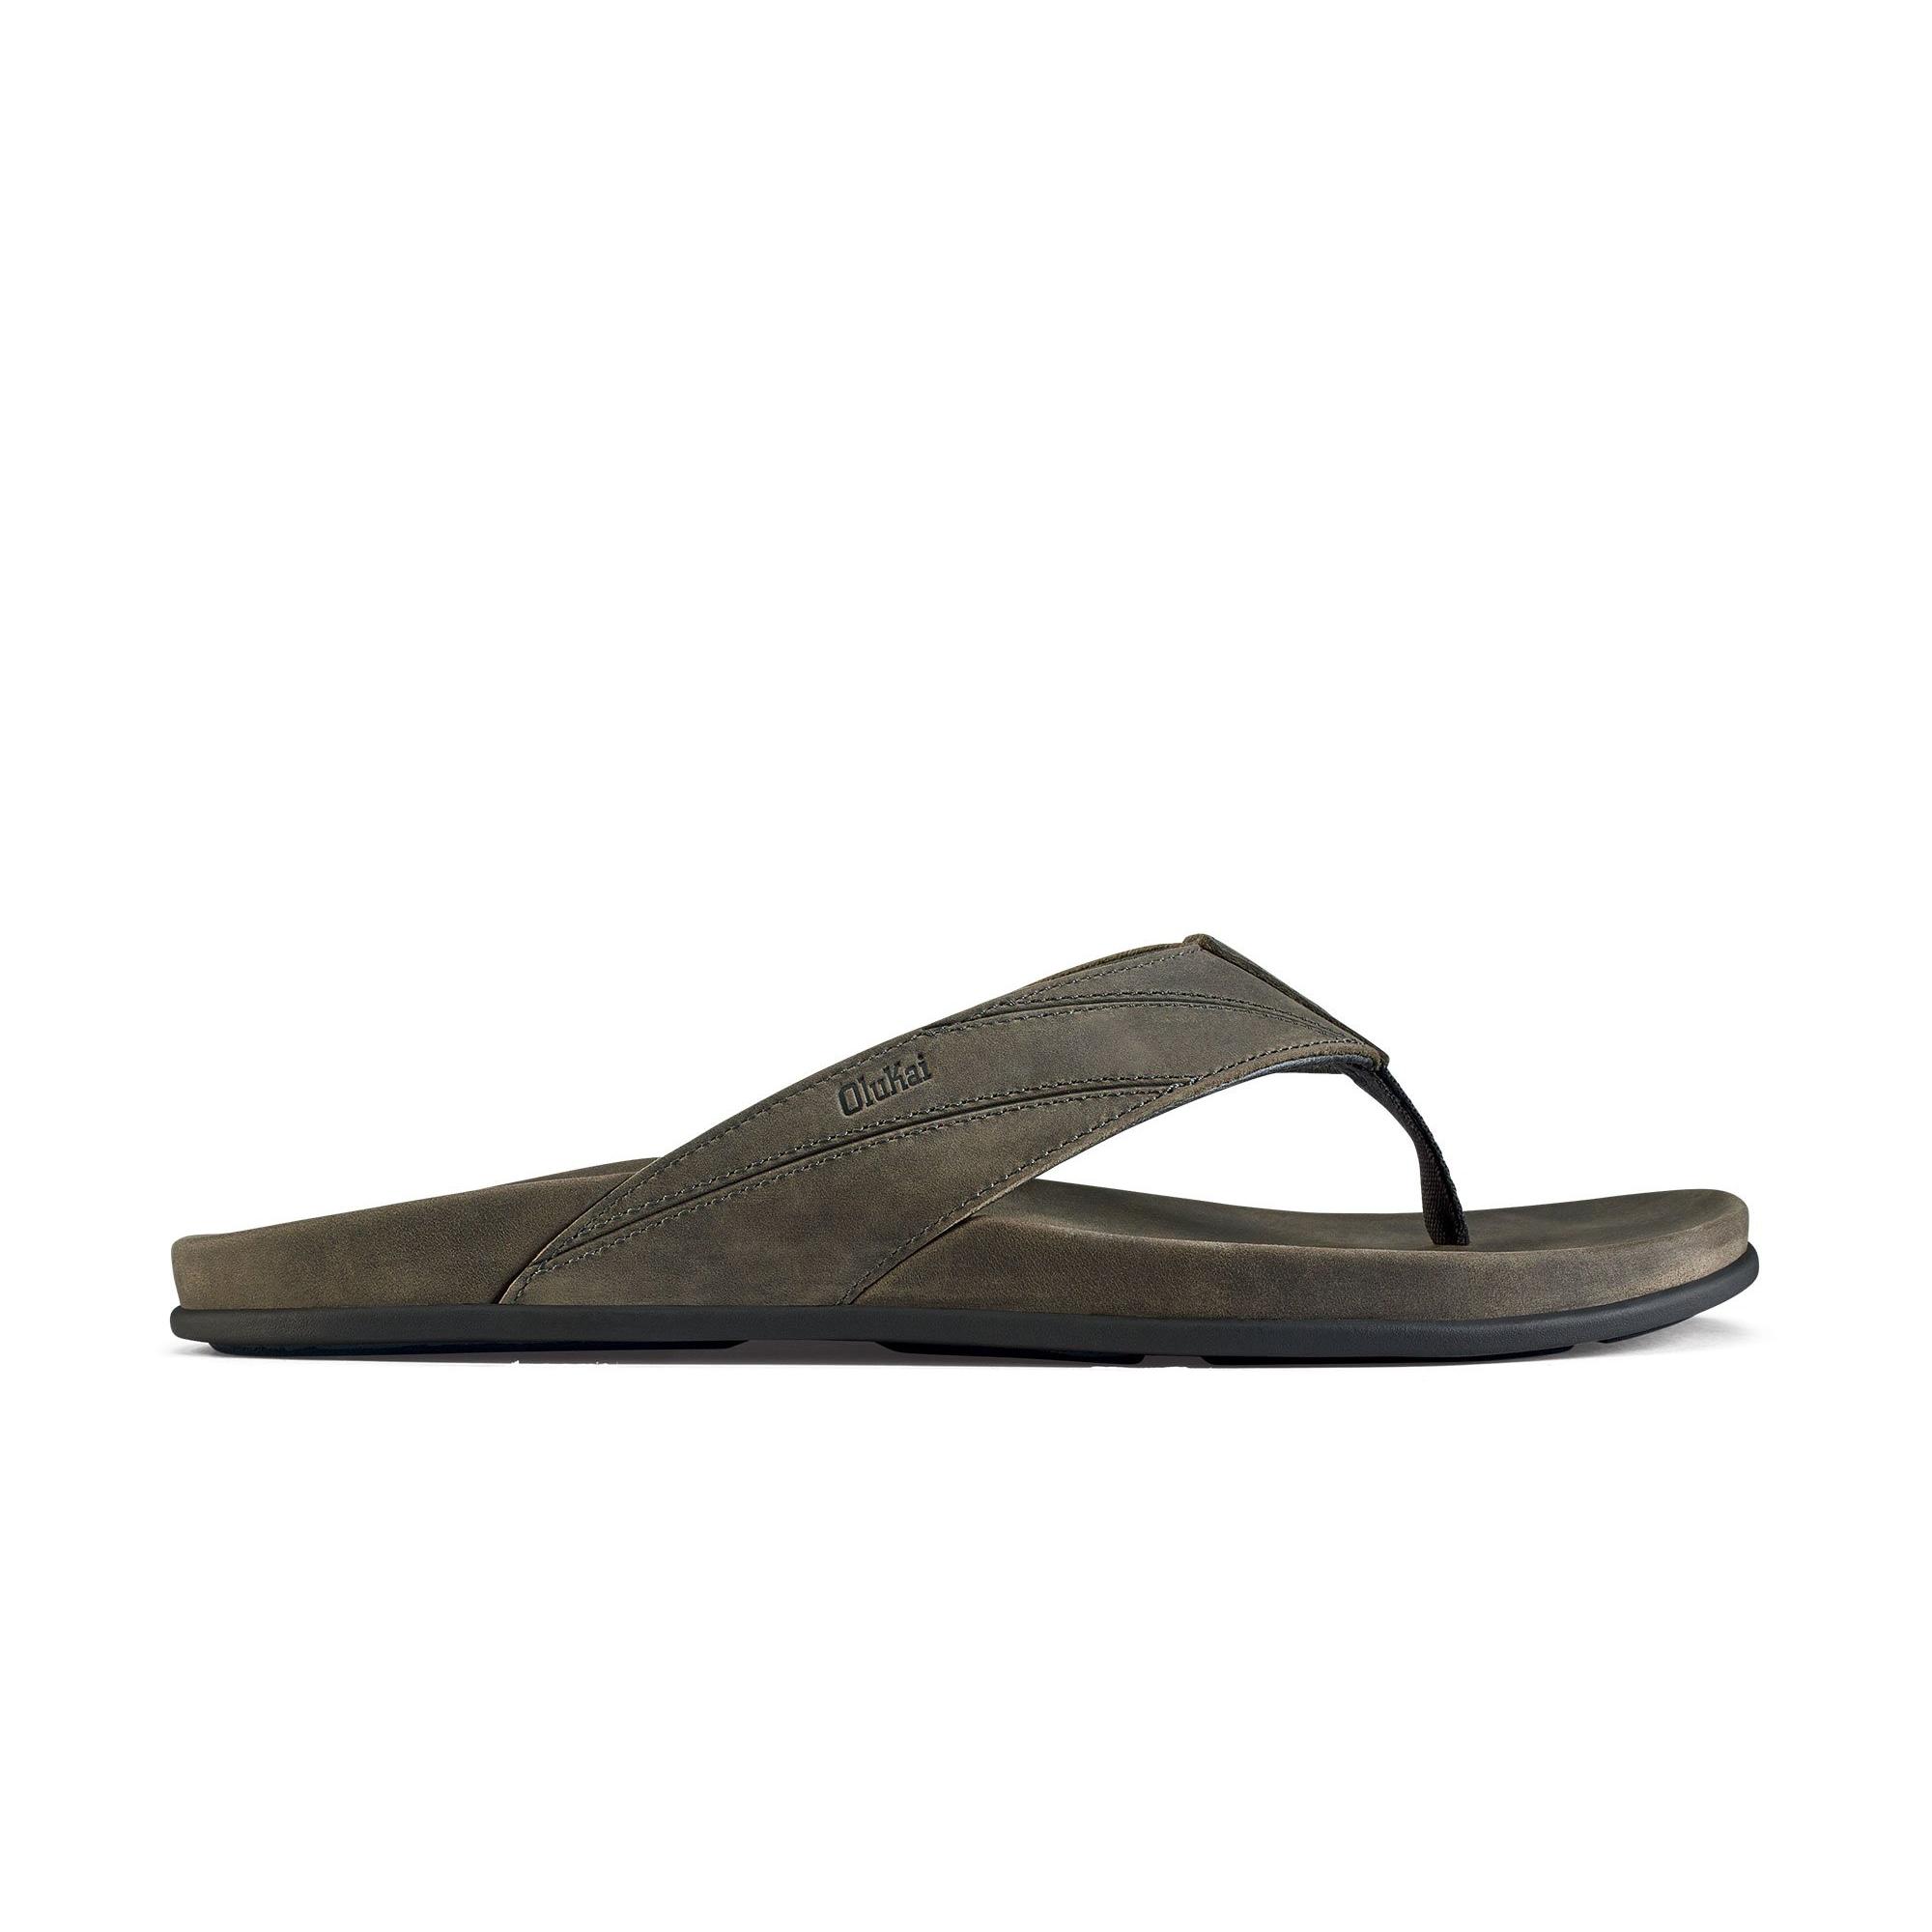 Pikoi Sandal - Men's